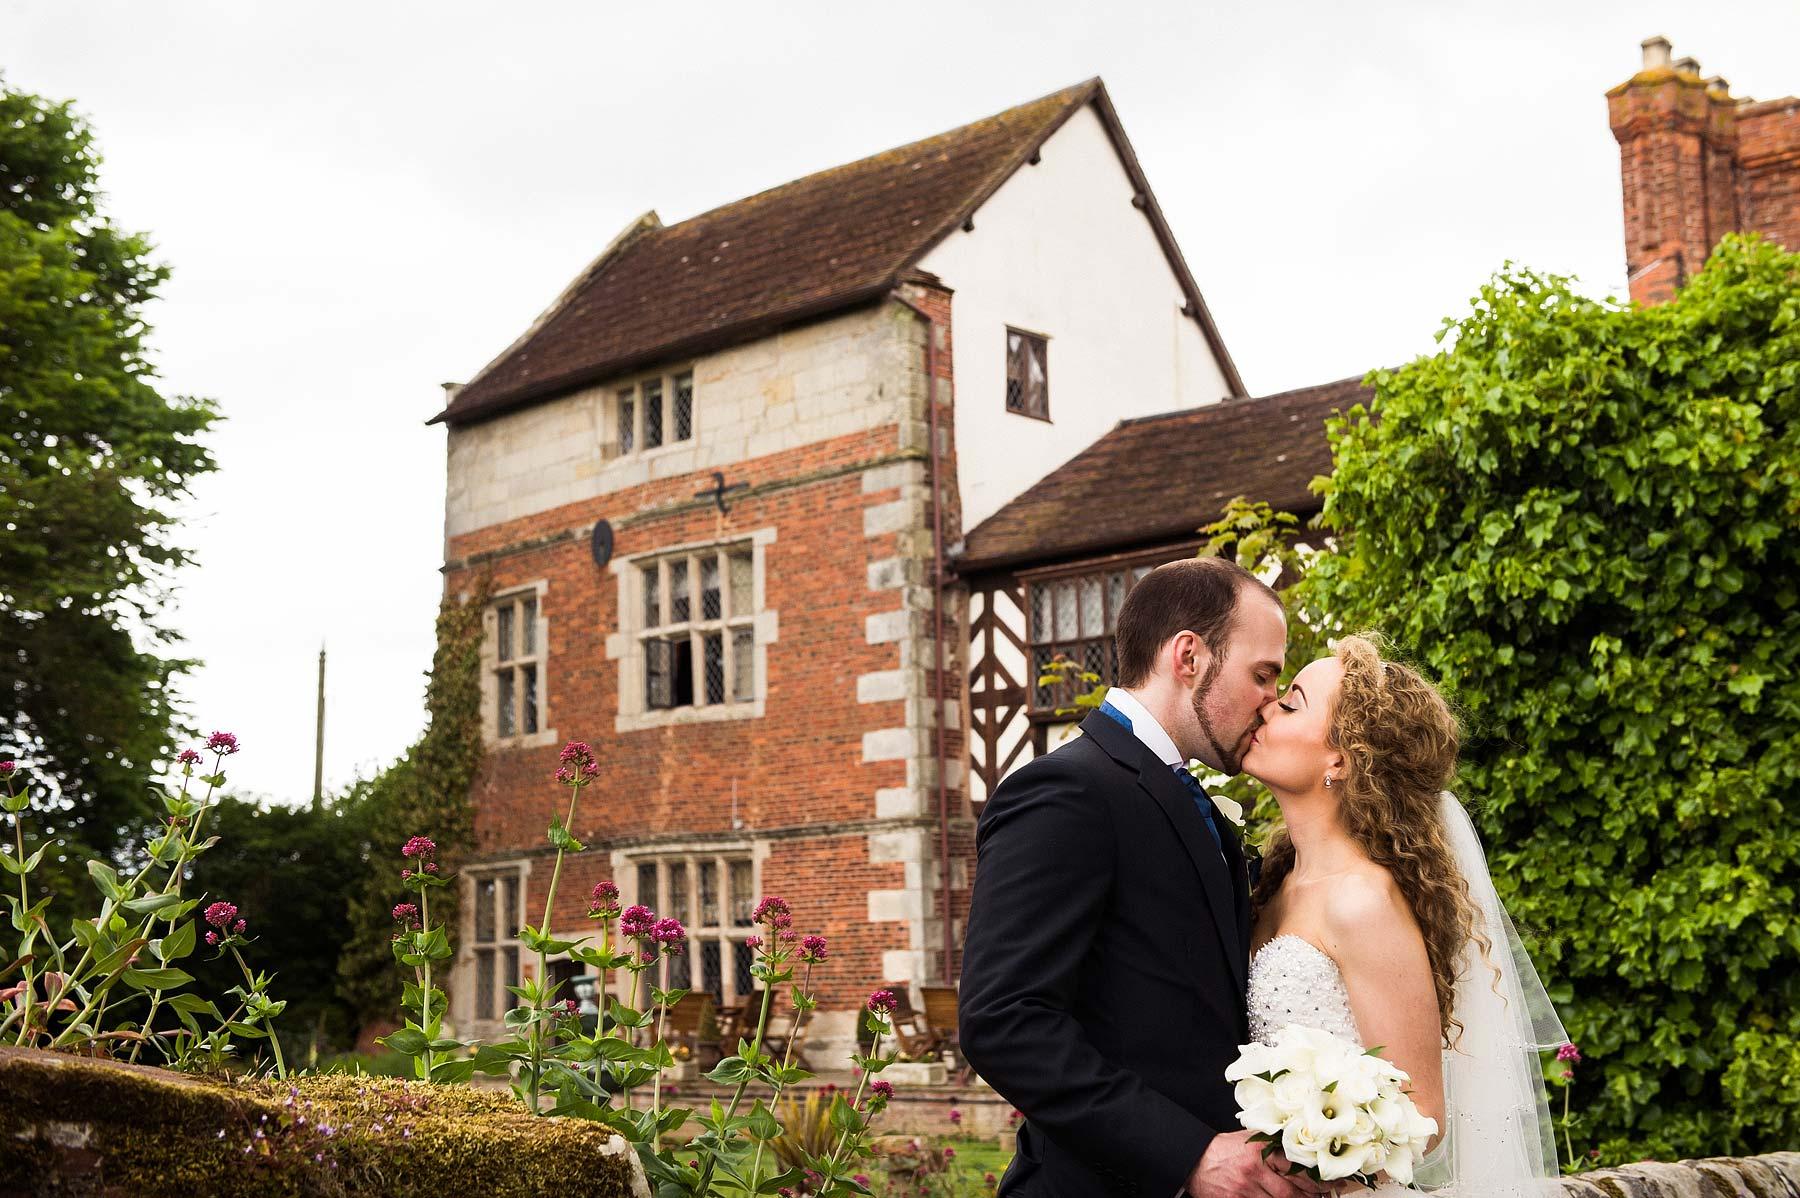 albright-hussey-manor-wedding-photographers-047